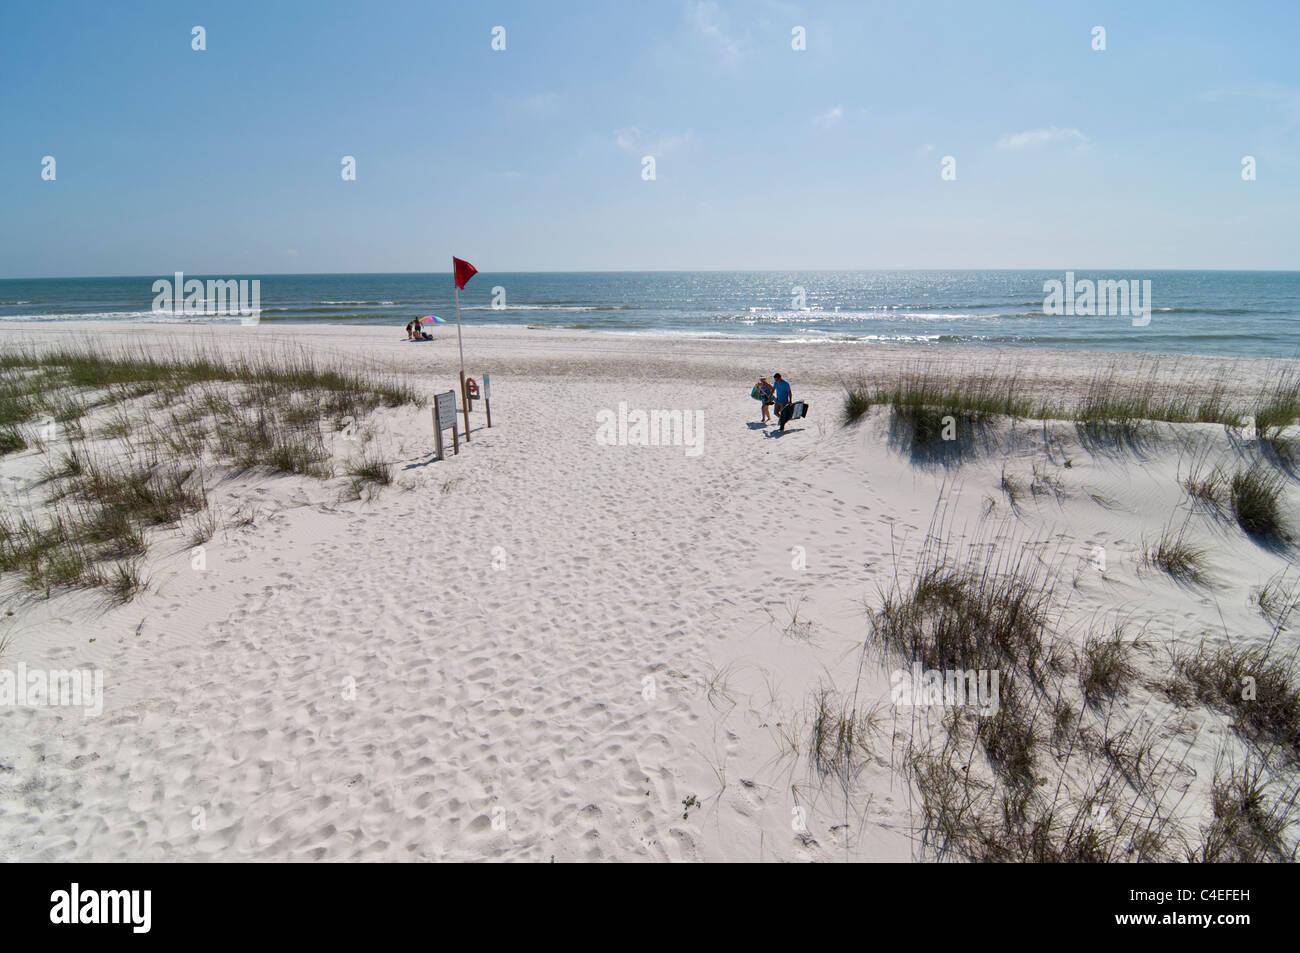 Gulf beaches along Florida's Panhandle at St. Joseph Peninsula State Park. Stock Photo